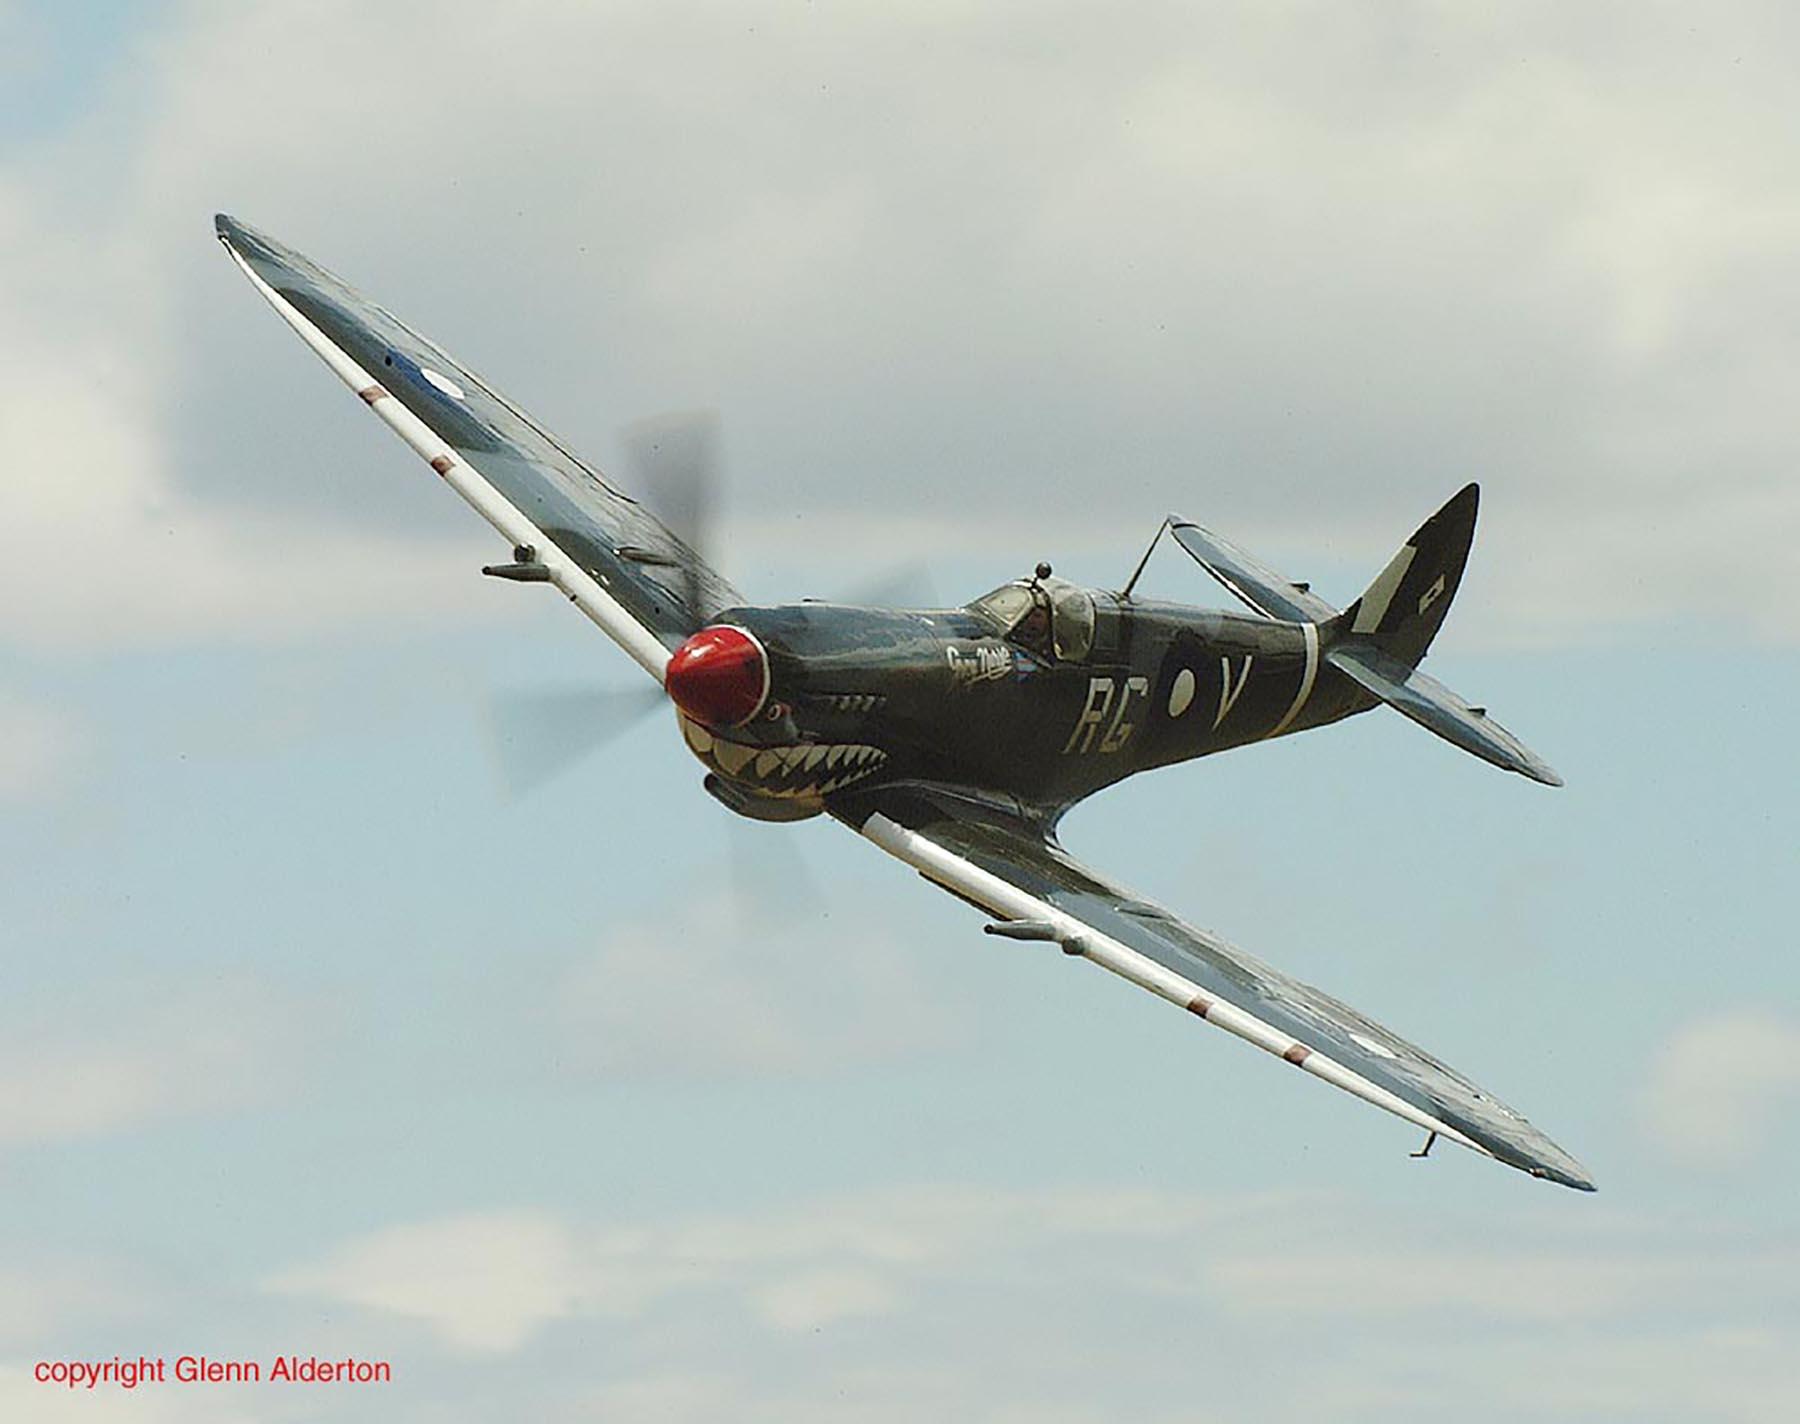 Airworthy Spitfire warbird RAAF 457Sqn RGV A58 602 10